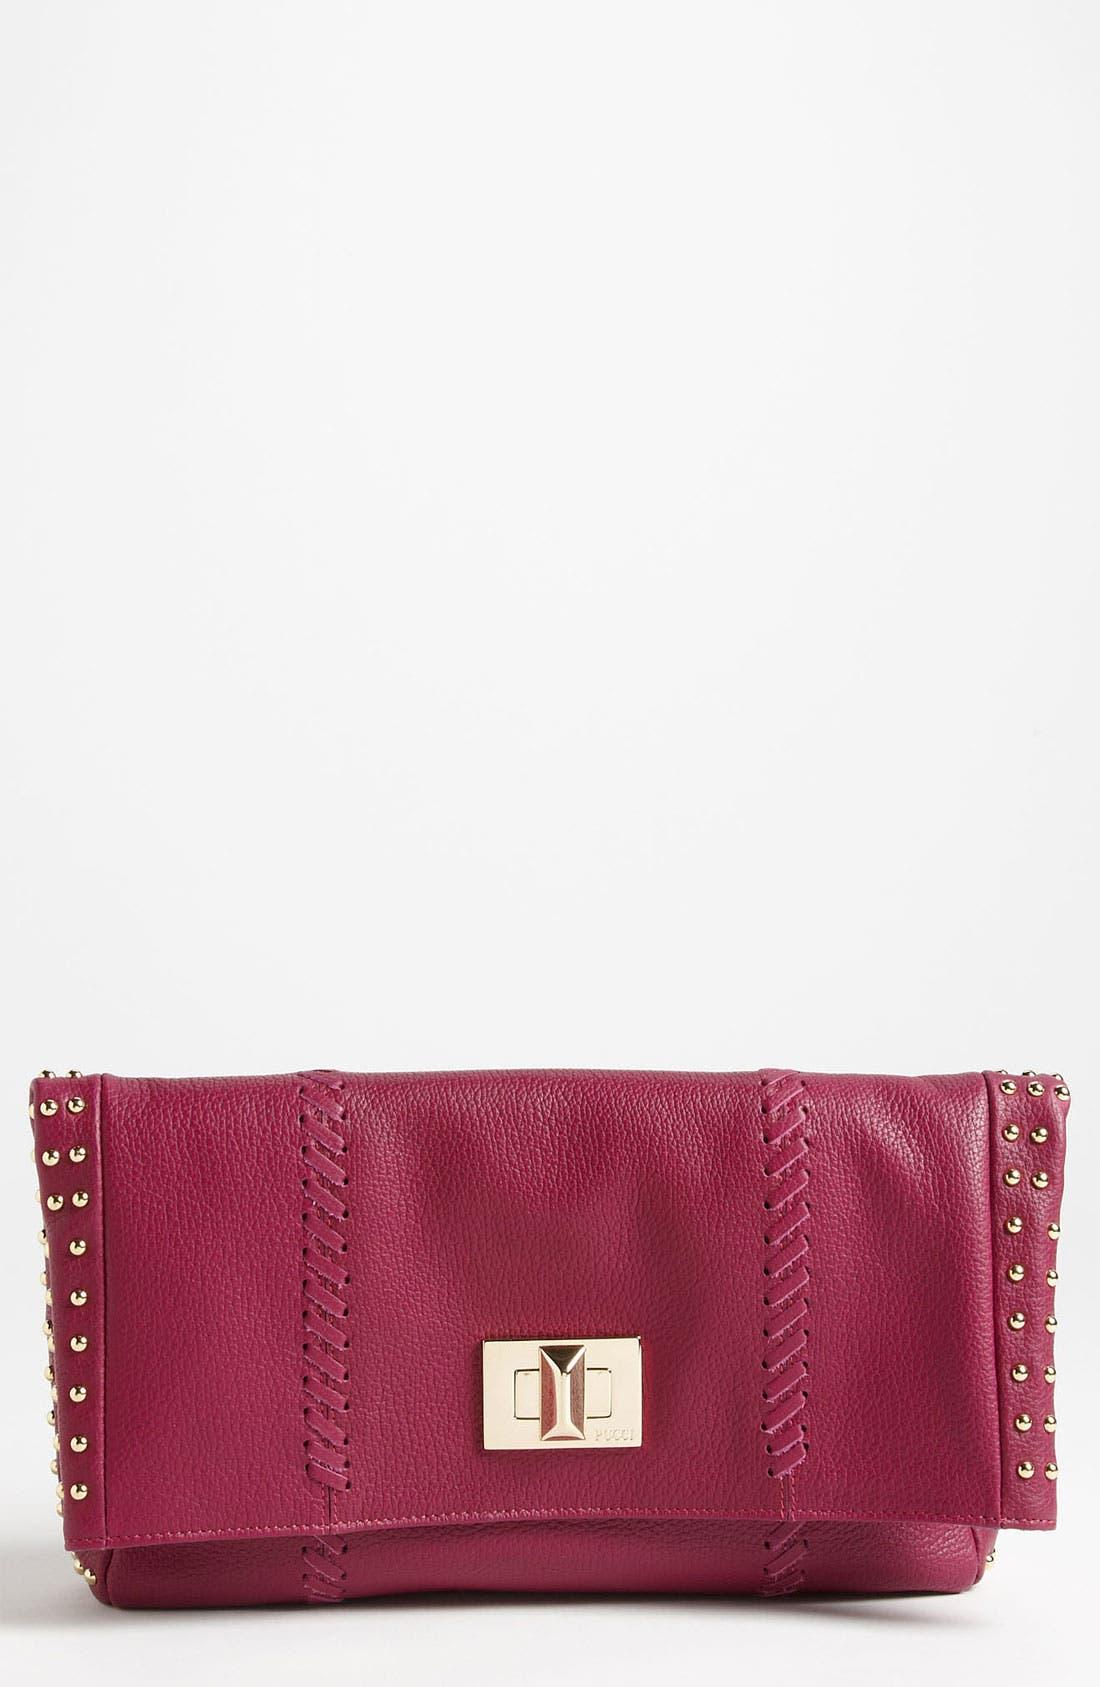 Main Image - Emilio Pucci Leather Fold Over Clutch